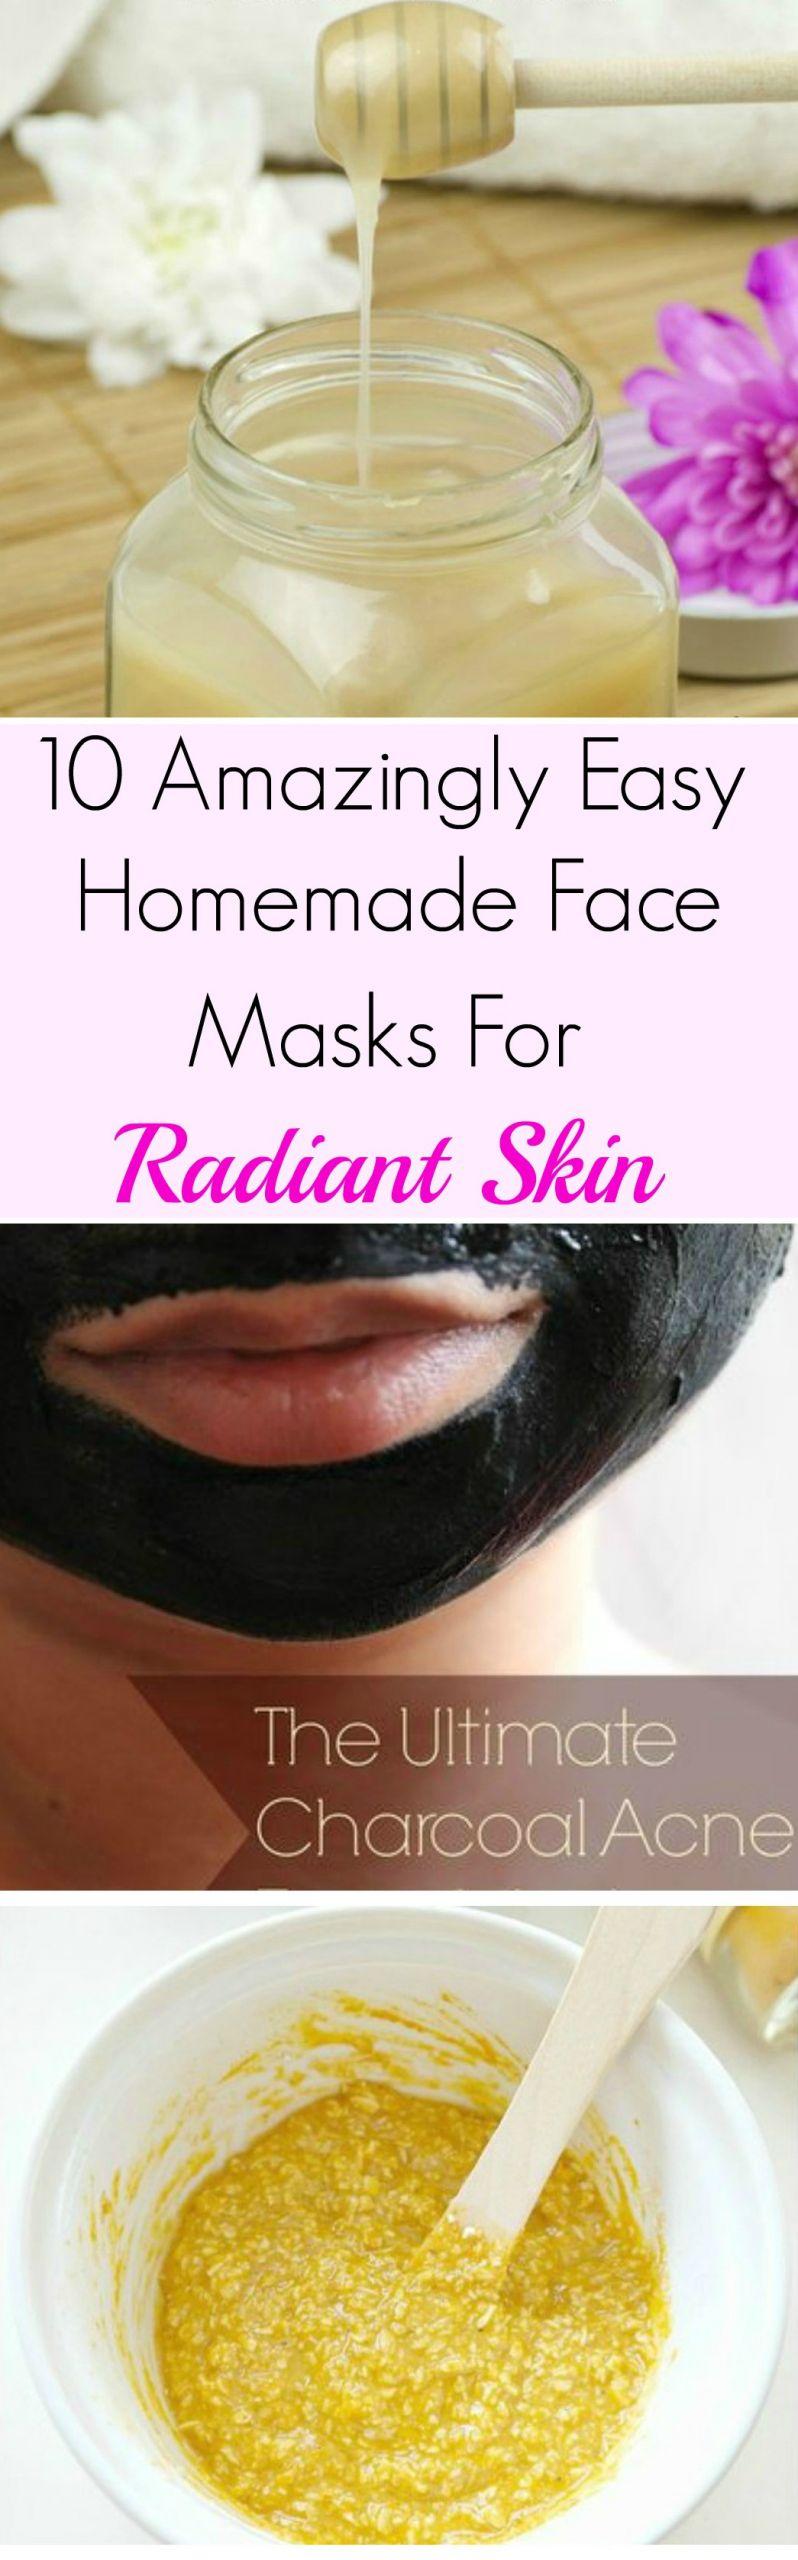 Simple DIY Face Masks  10 Amazingly Easy Homemade Face Masks For Radiant Skin